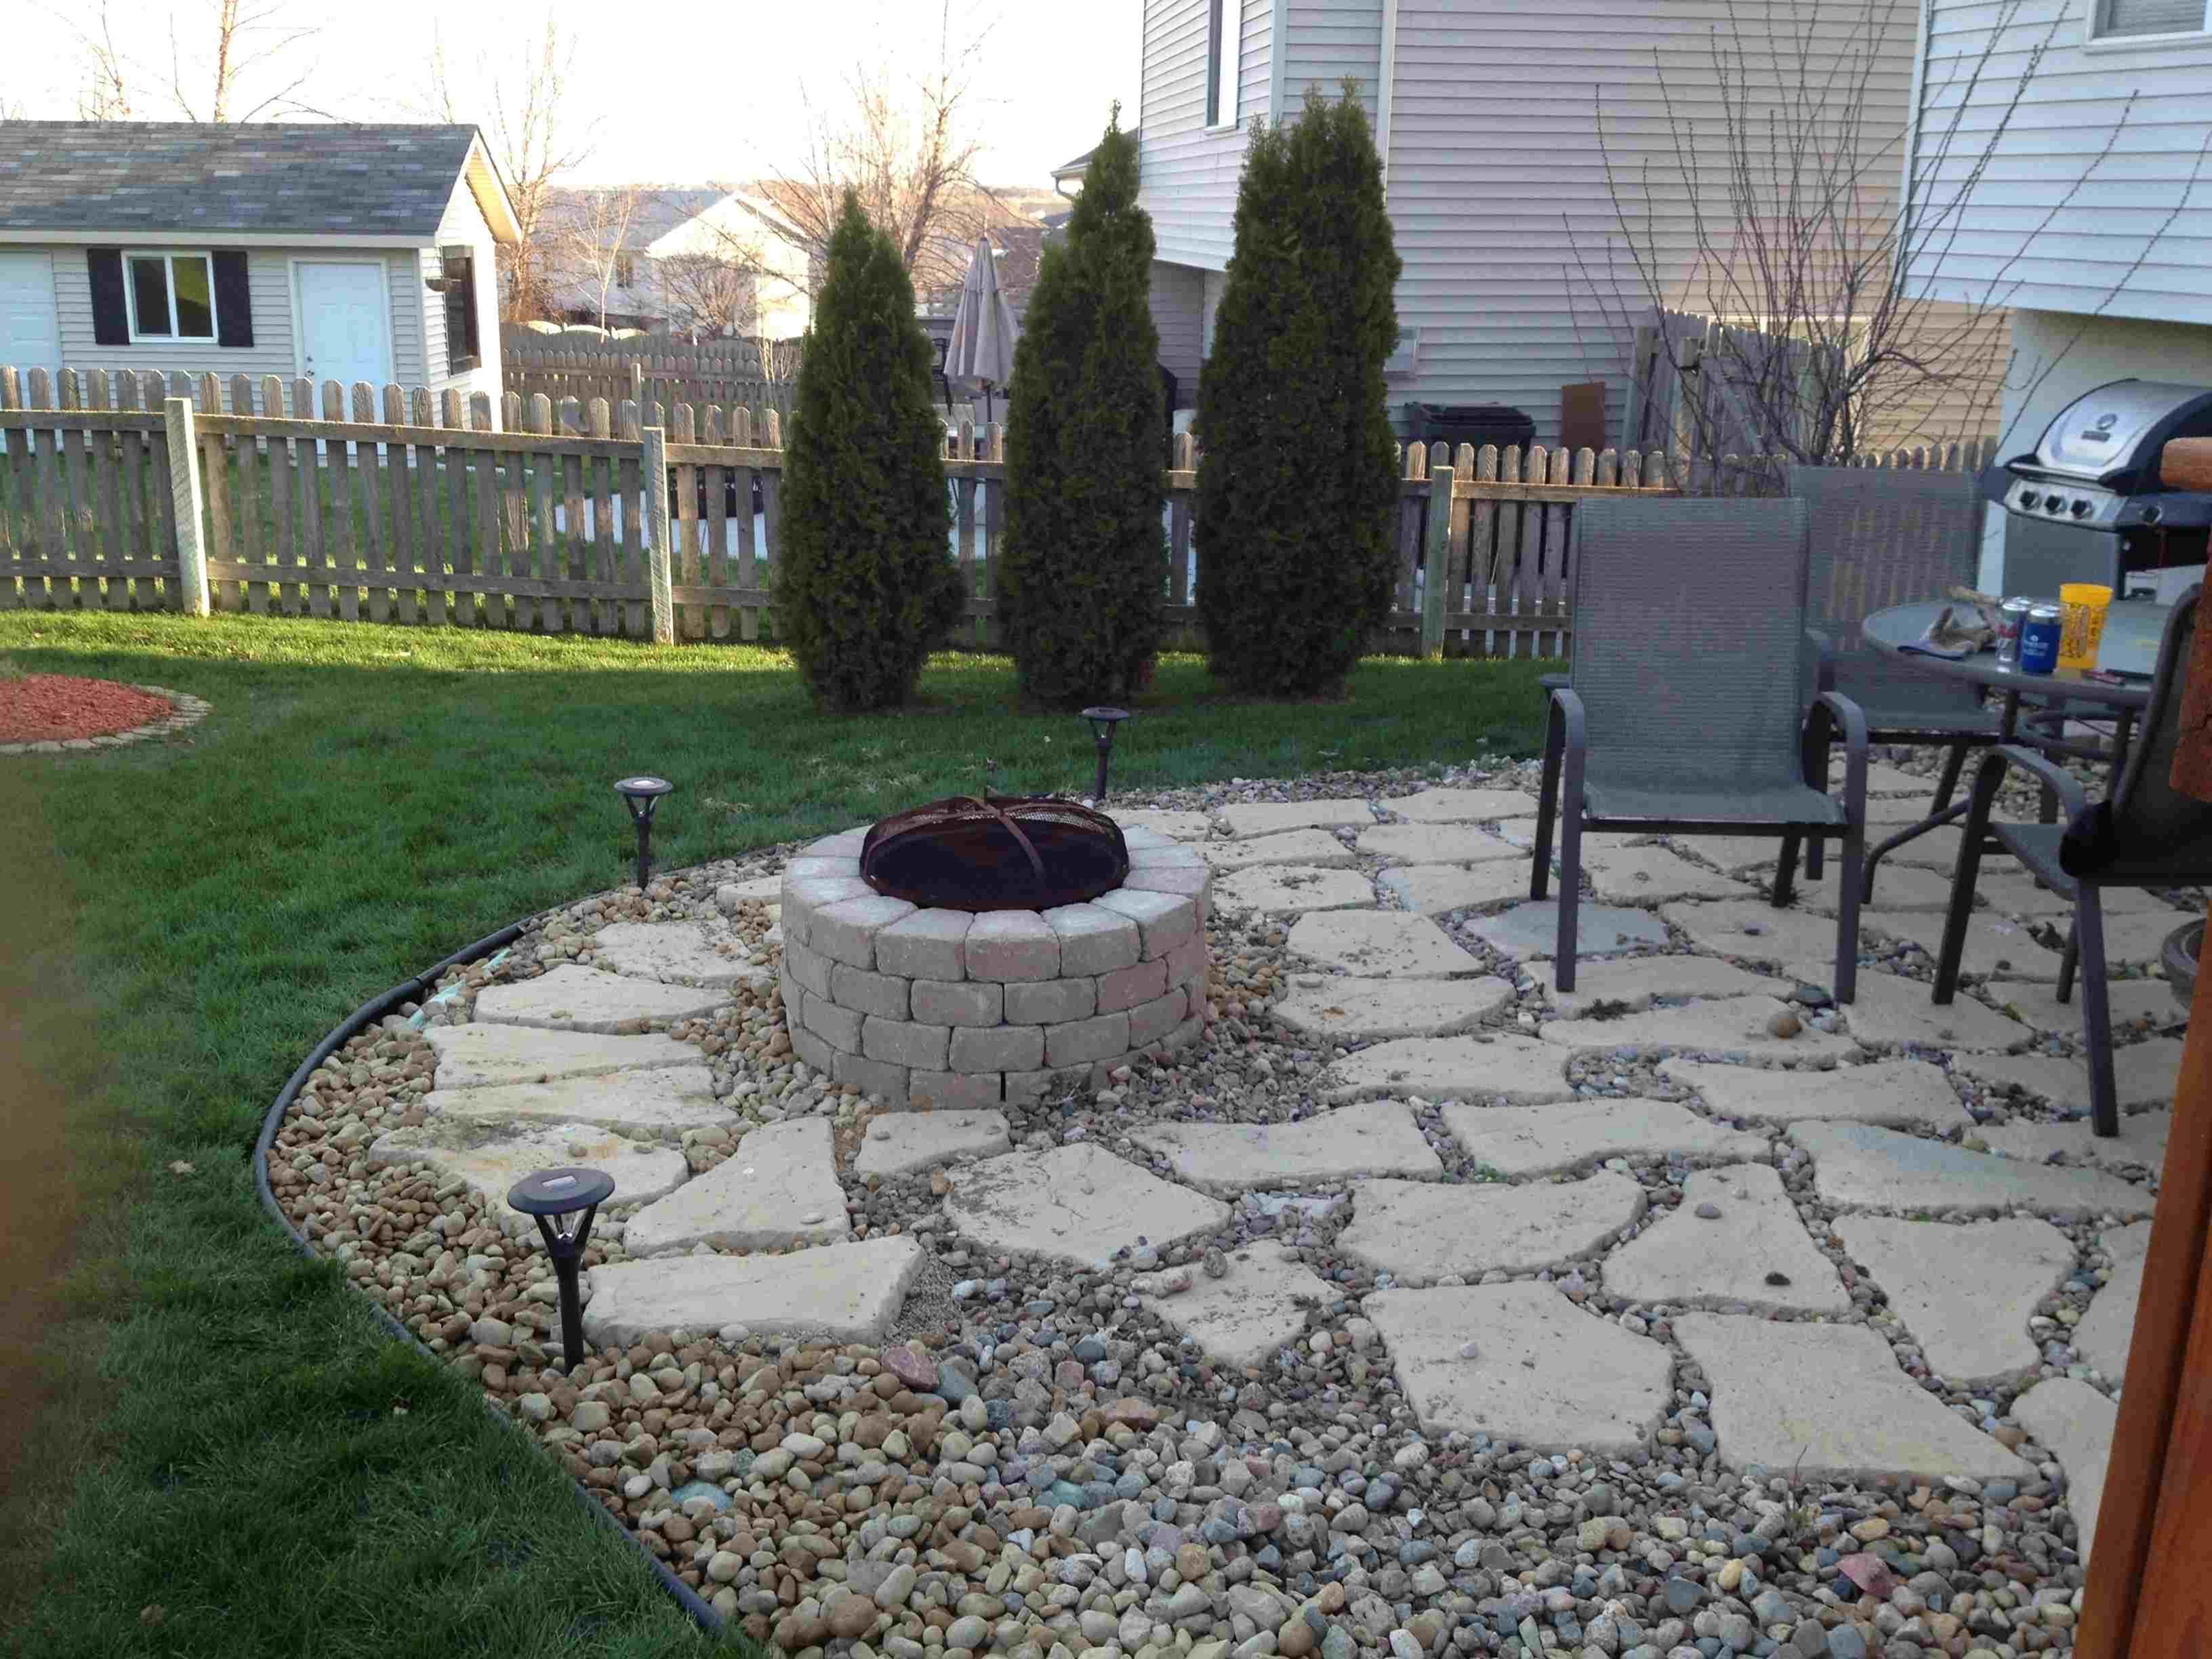 Backyard Paving Stone Patterns Design Patio Ide Pea Gravel Patio Backyard Garden Design Gravel Patio